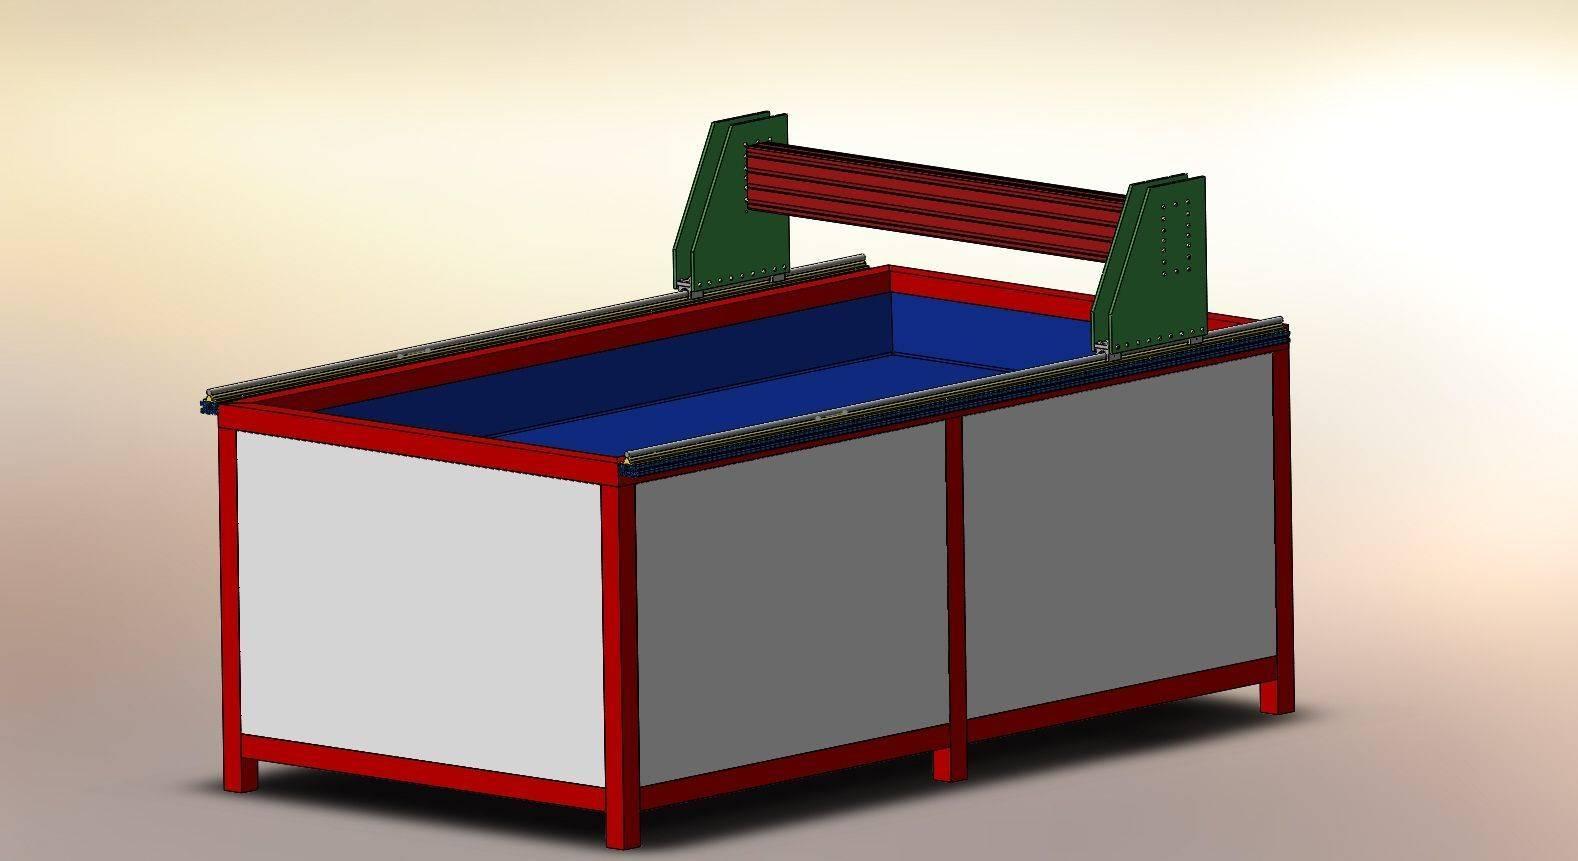 Assemblage table plasma 1000 X 2000 juju .JPG